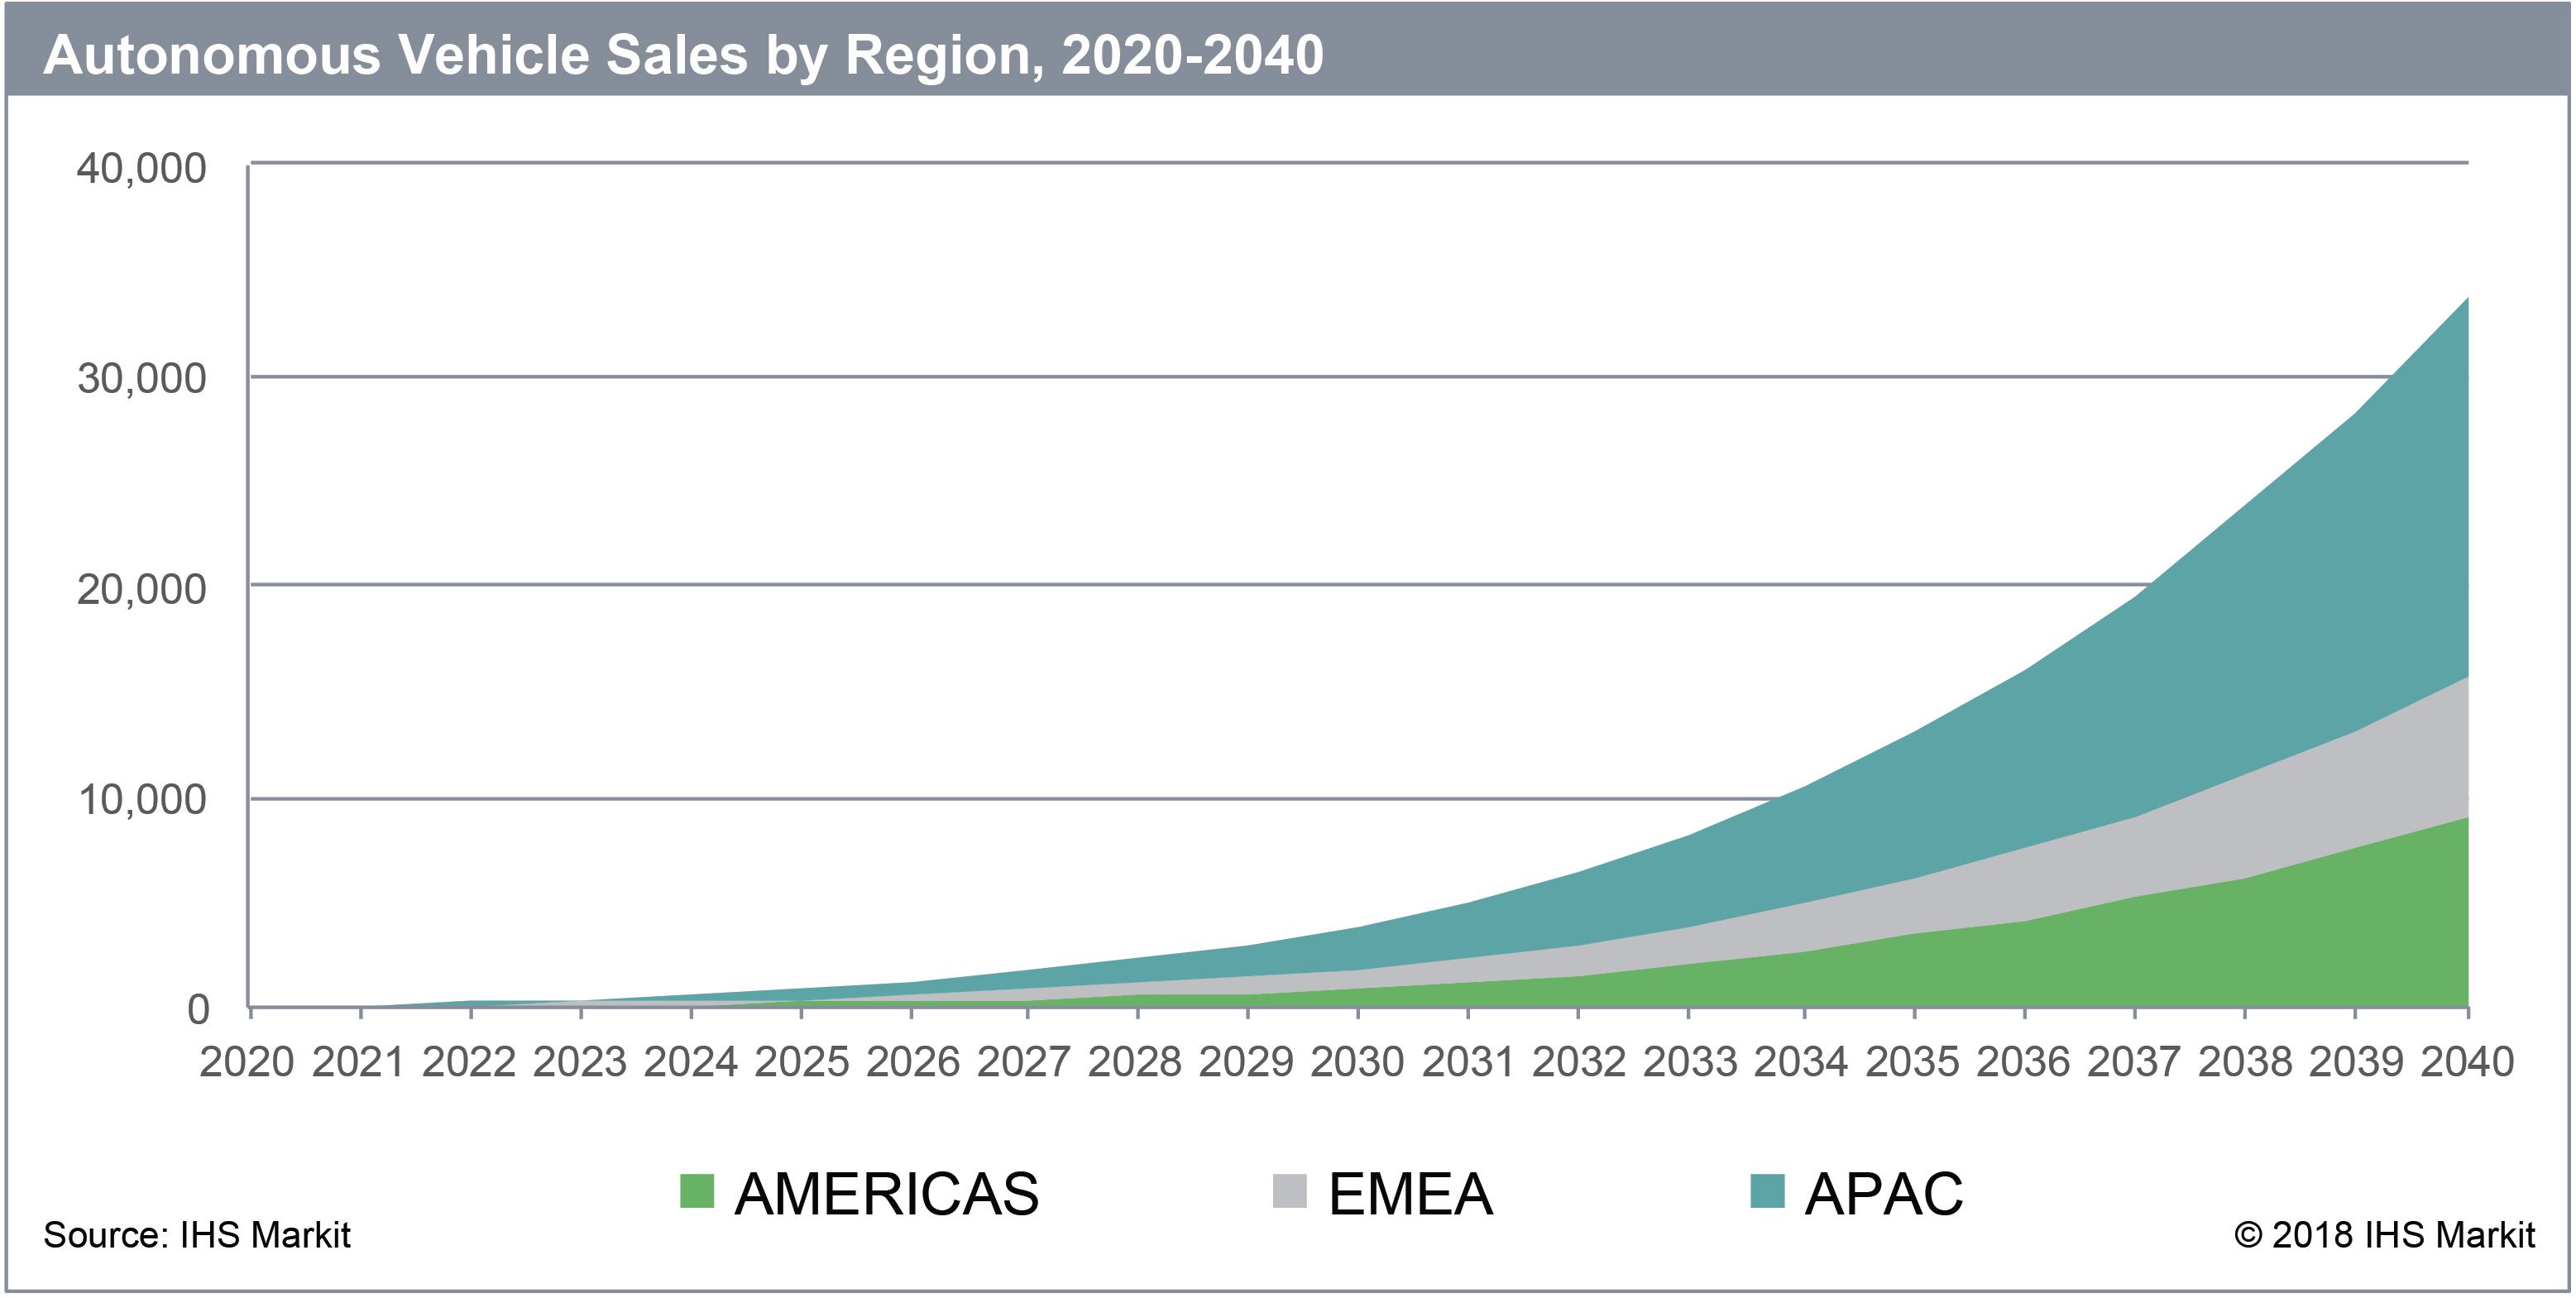 autonomous vehicle sales to surpass 33 million annually in 2040